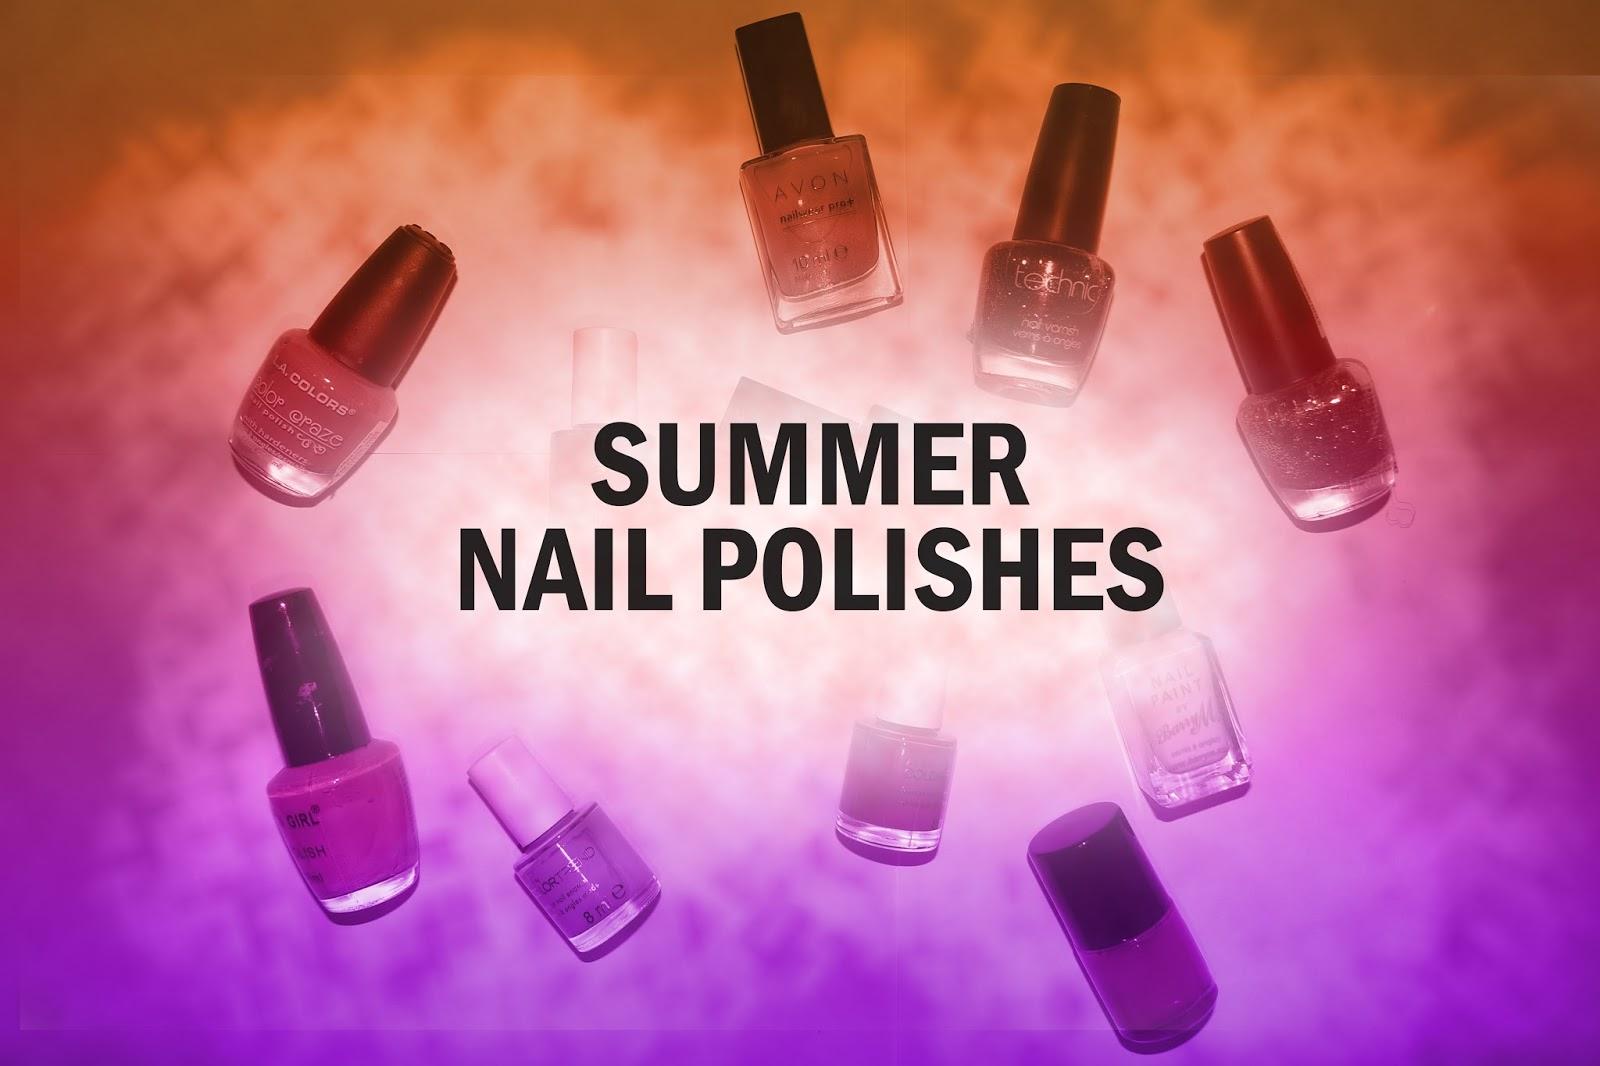 Tashika Bailey | Summer Nail Polishes